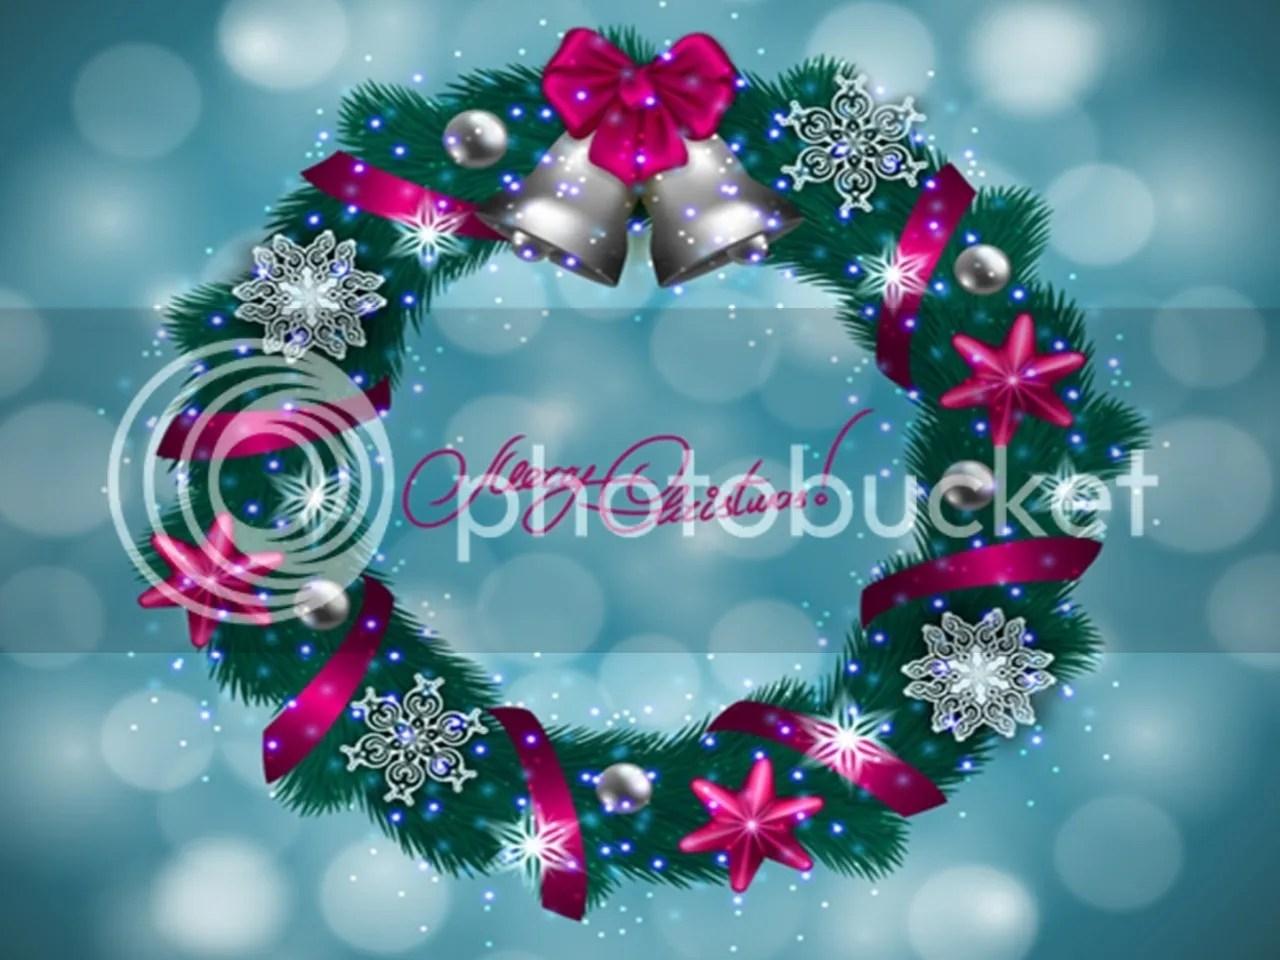 photo Christmas bells_zpsqegcrbsm.jpg